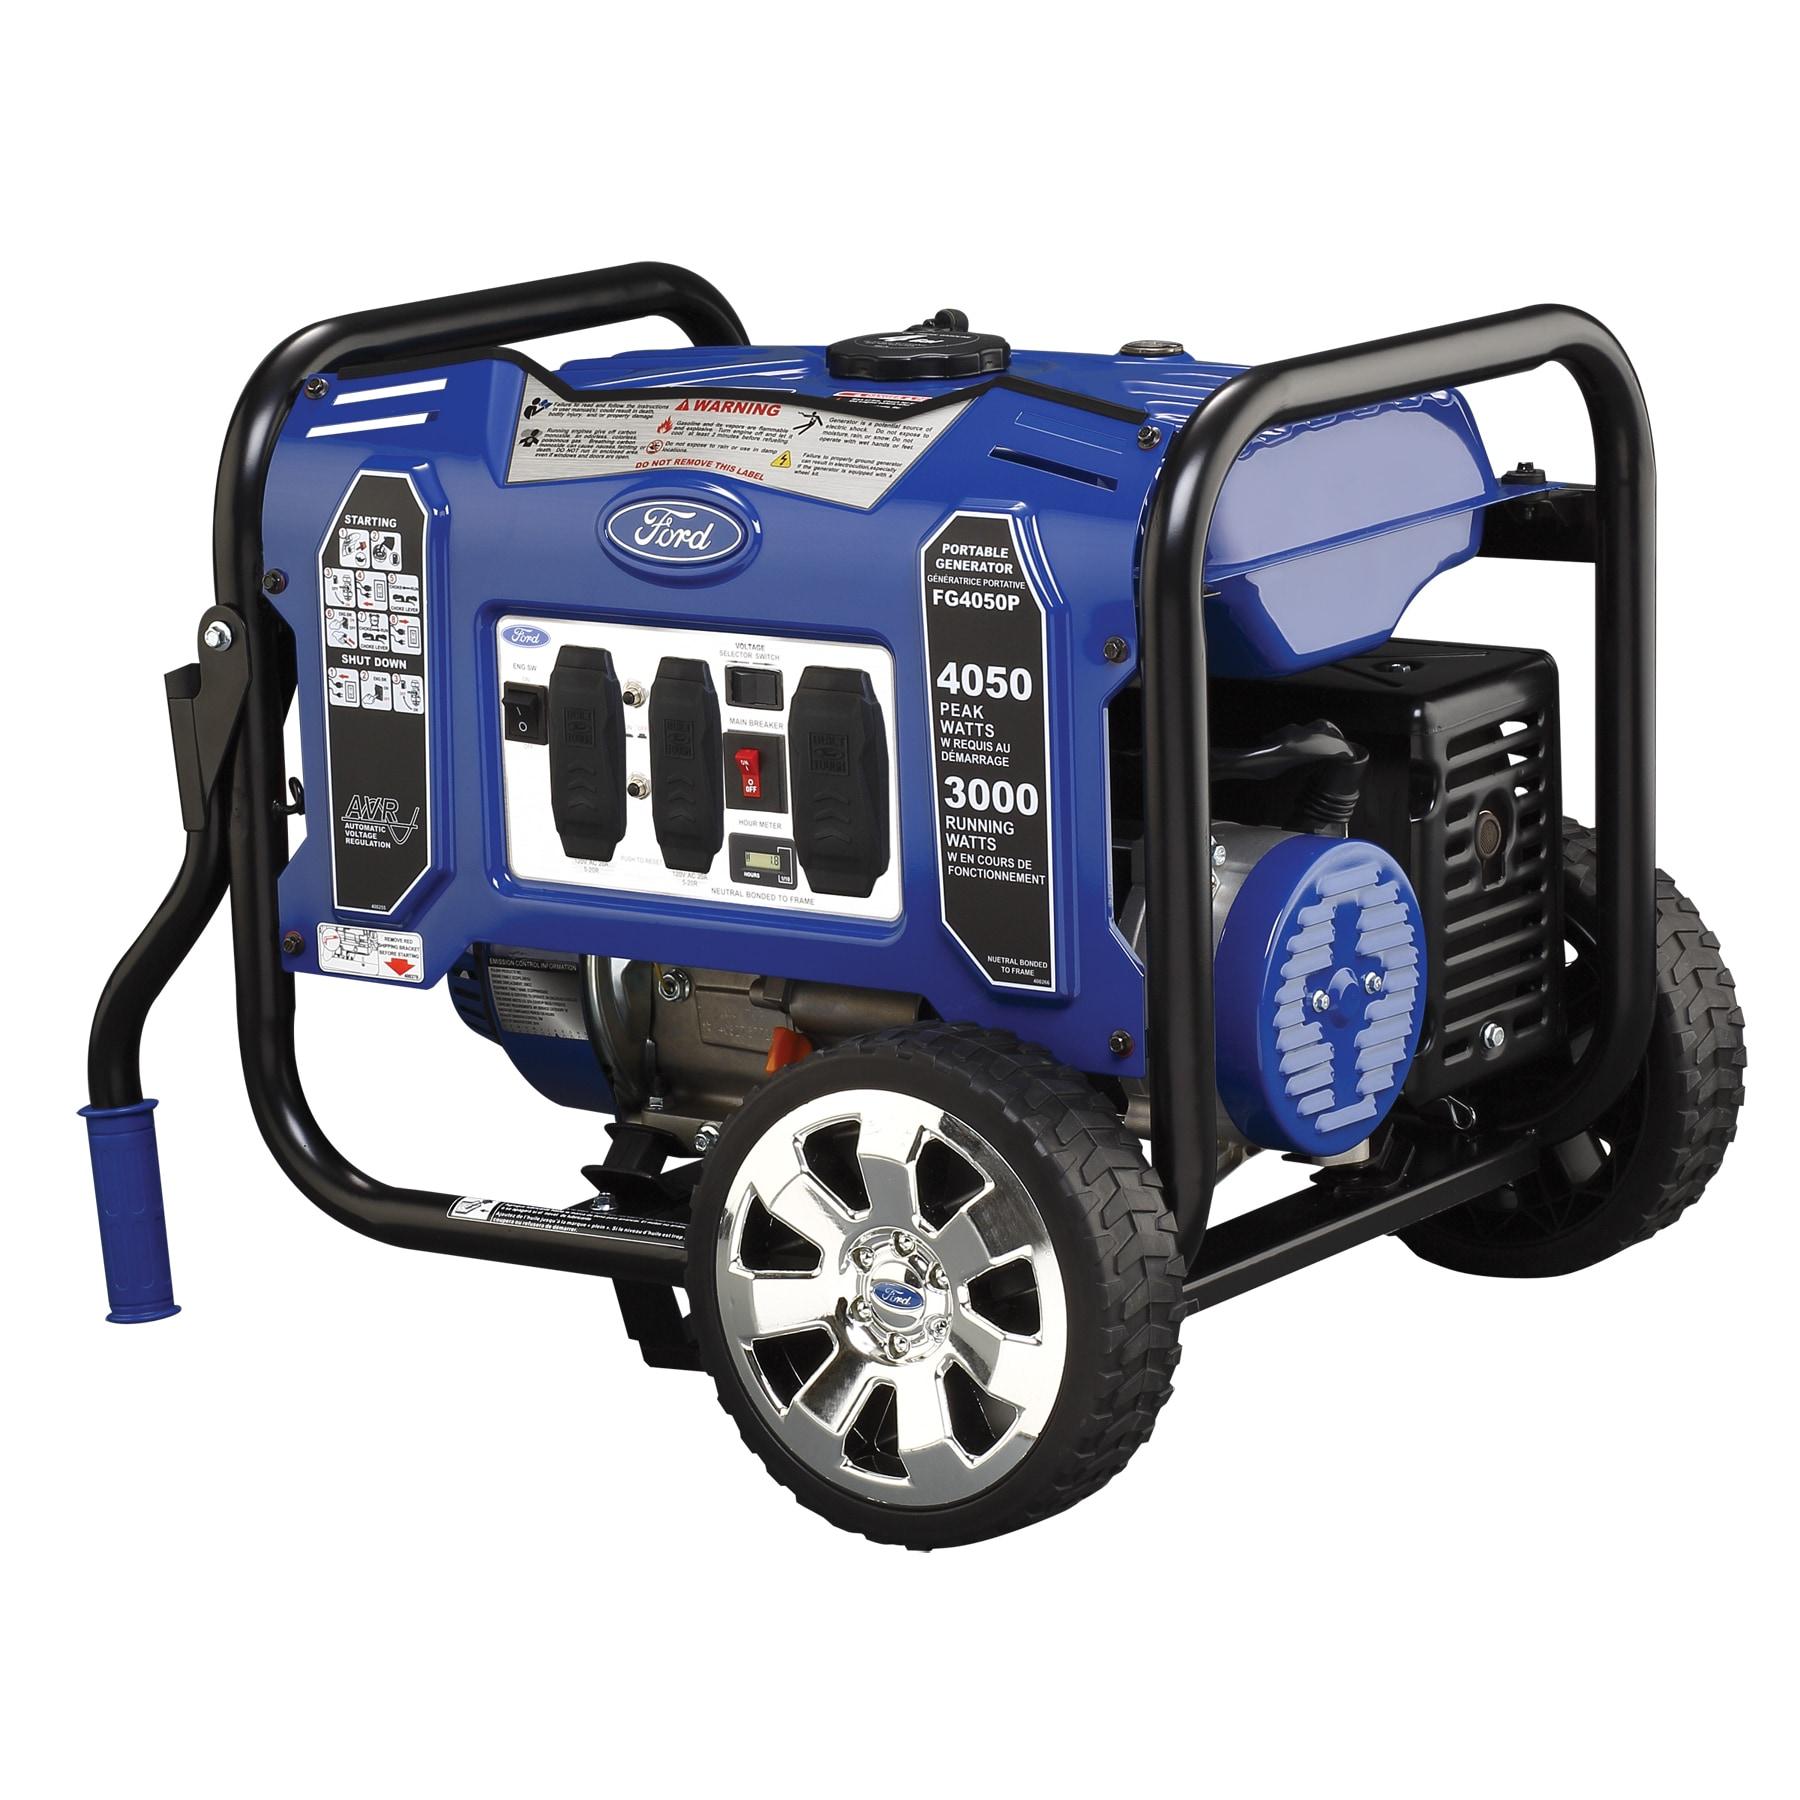 Ford 4050 watt Portable Generator Free Shipping Today